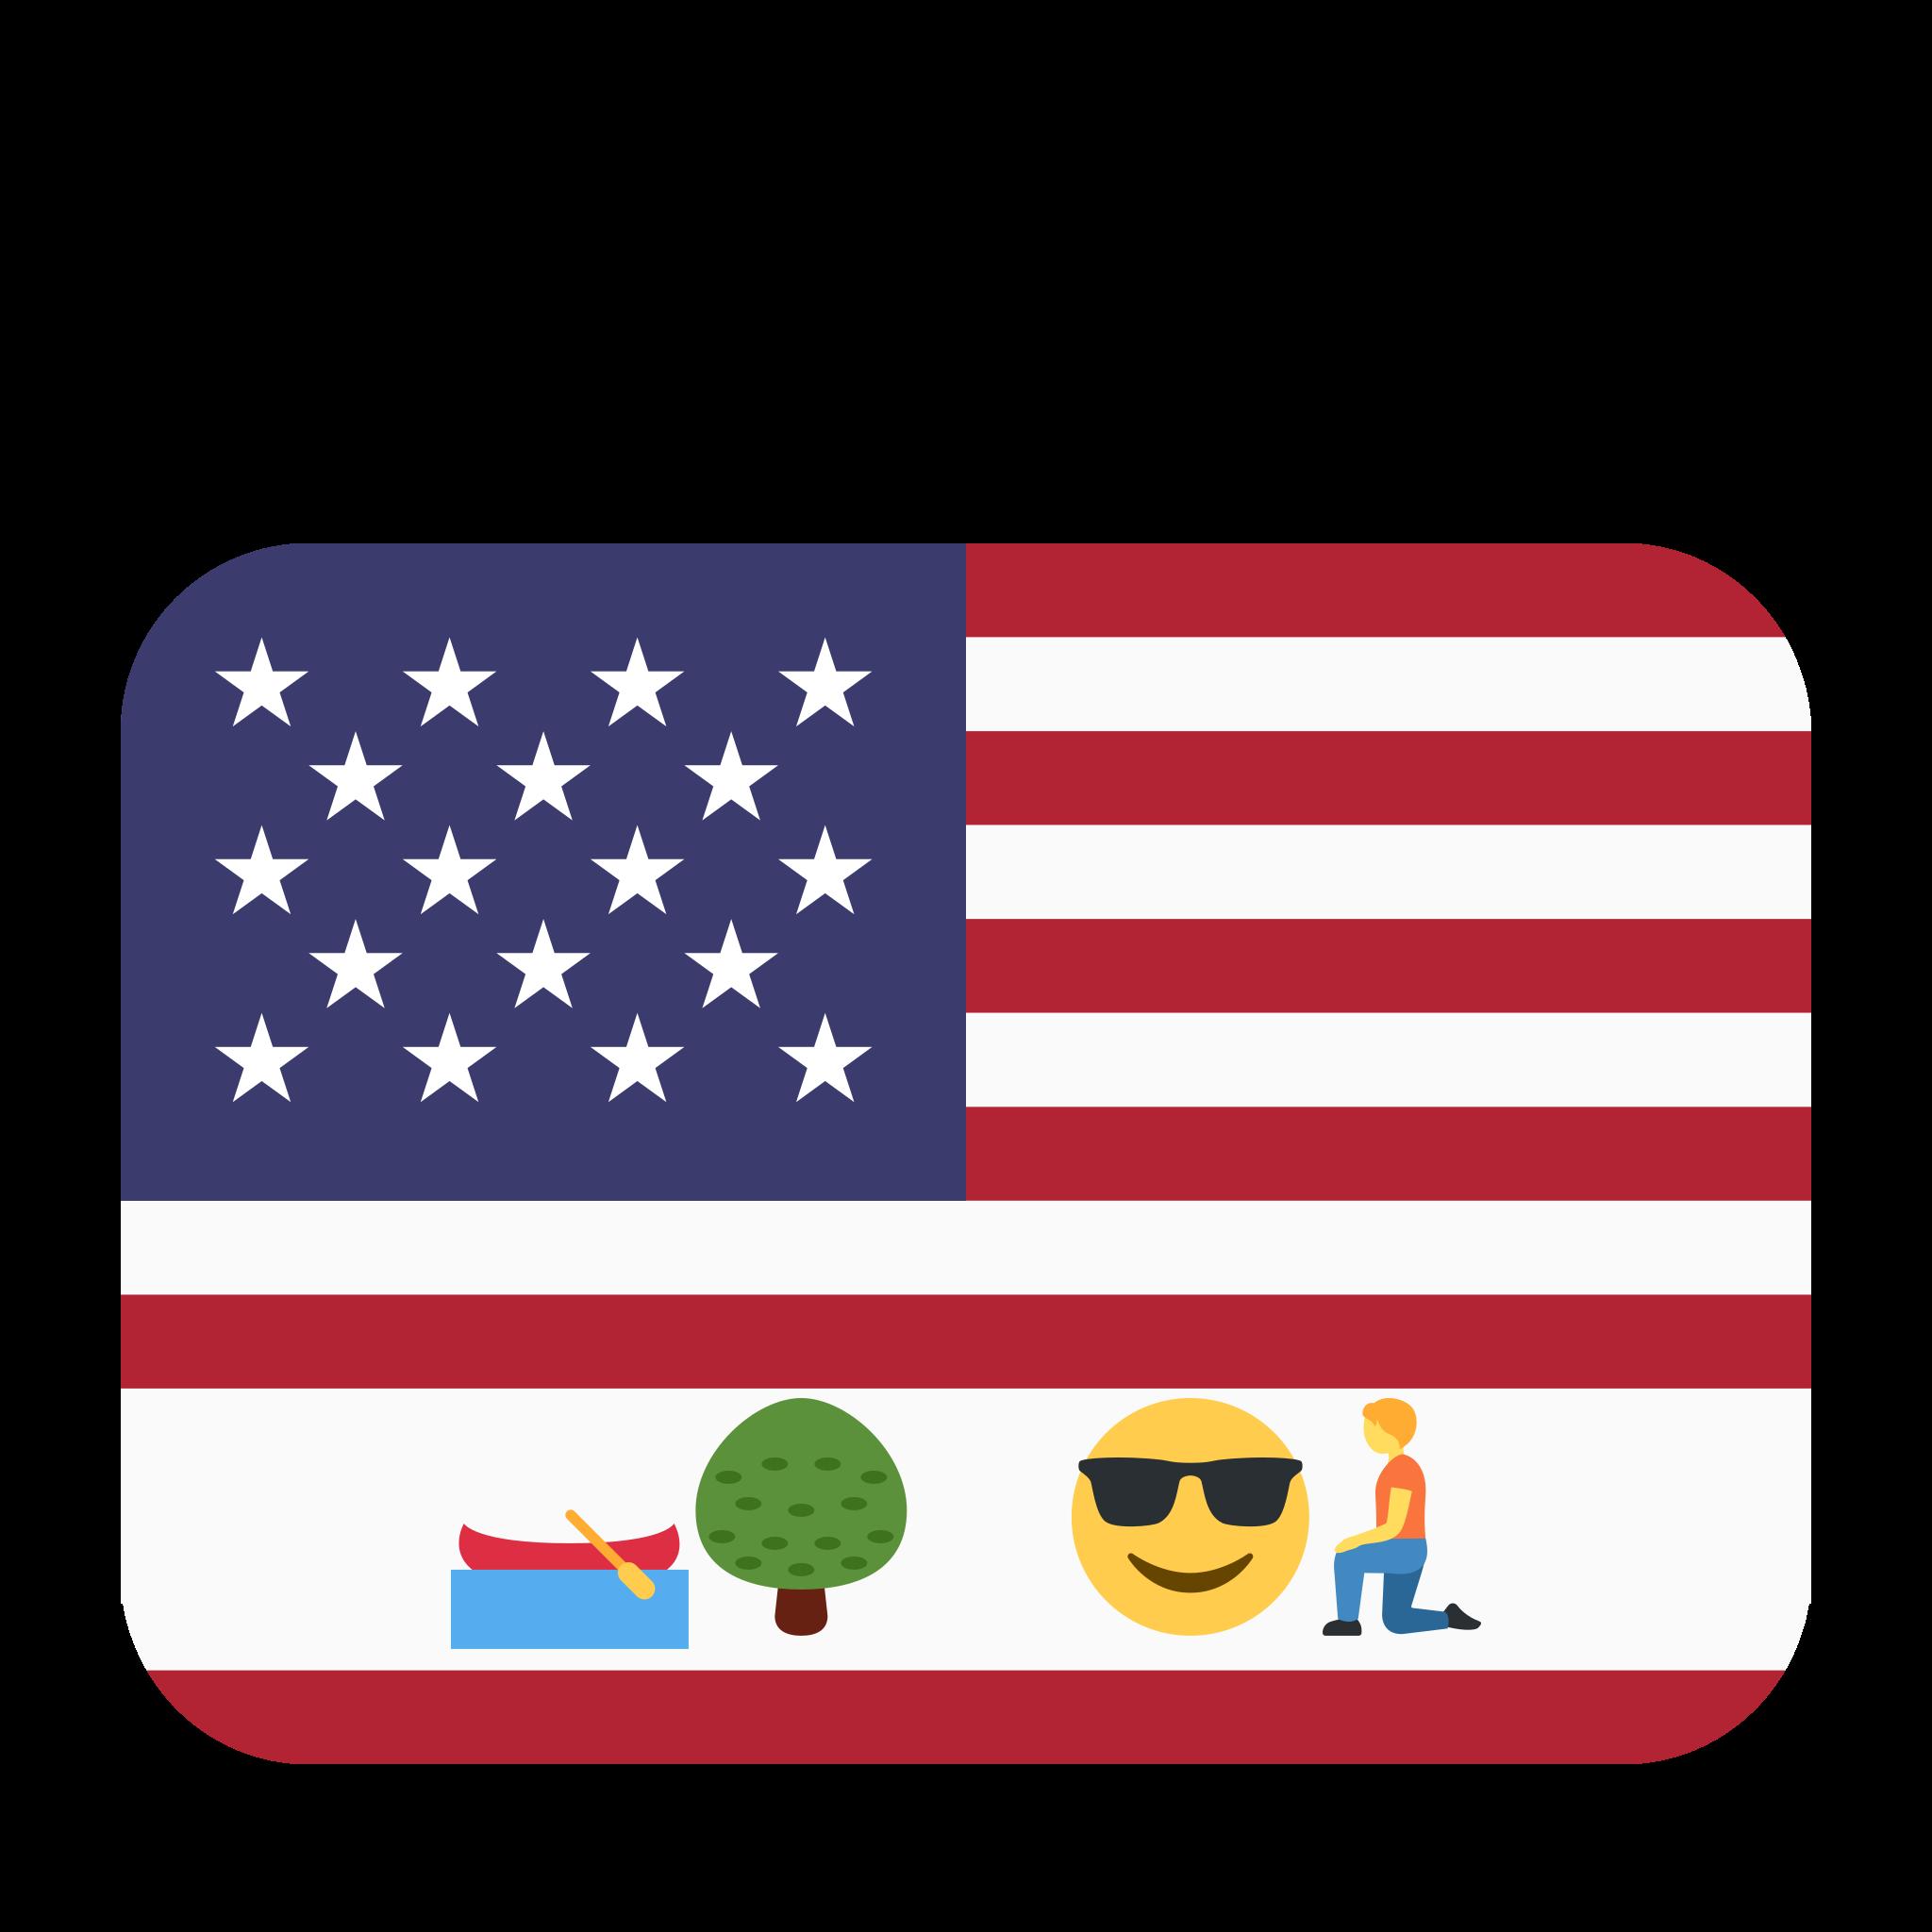 Emoji Riddles™: American History by Sidework AI